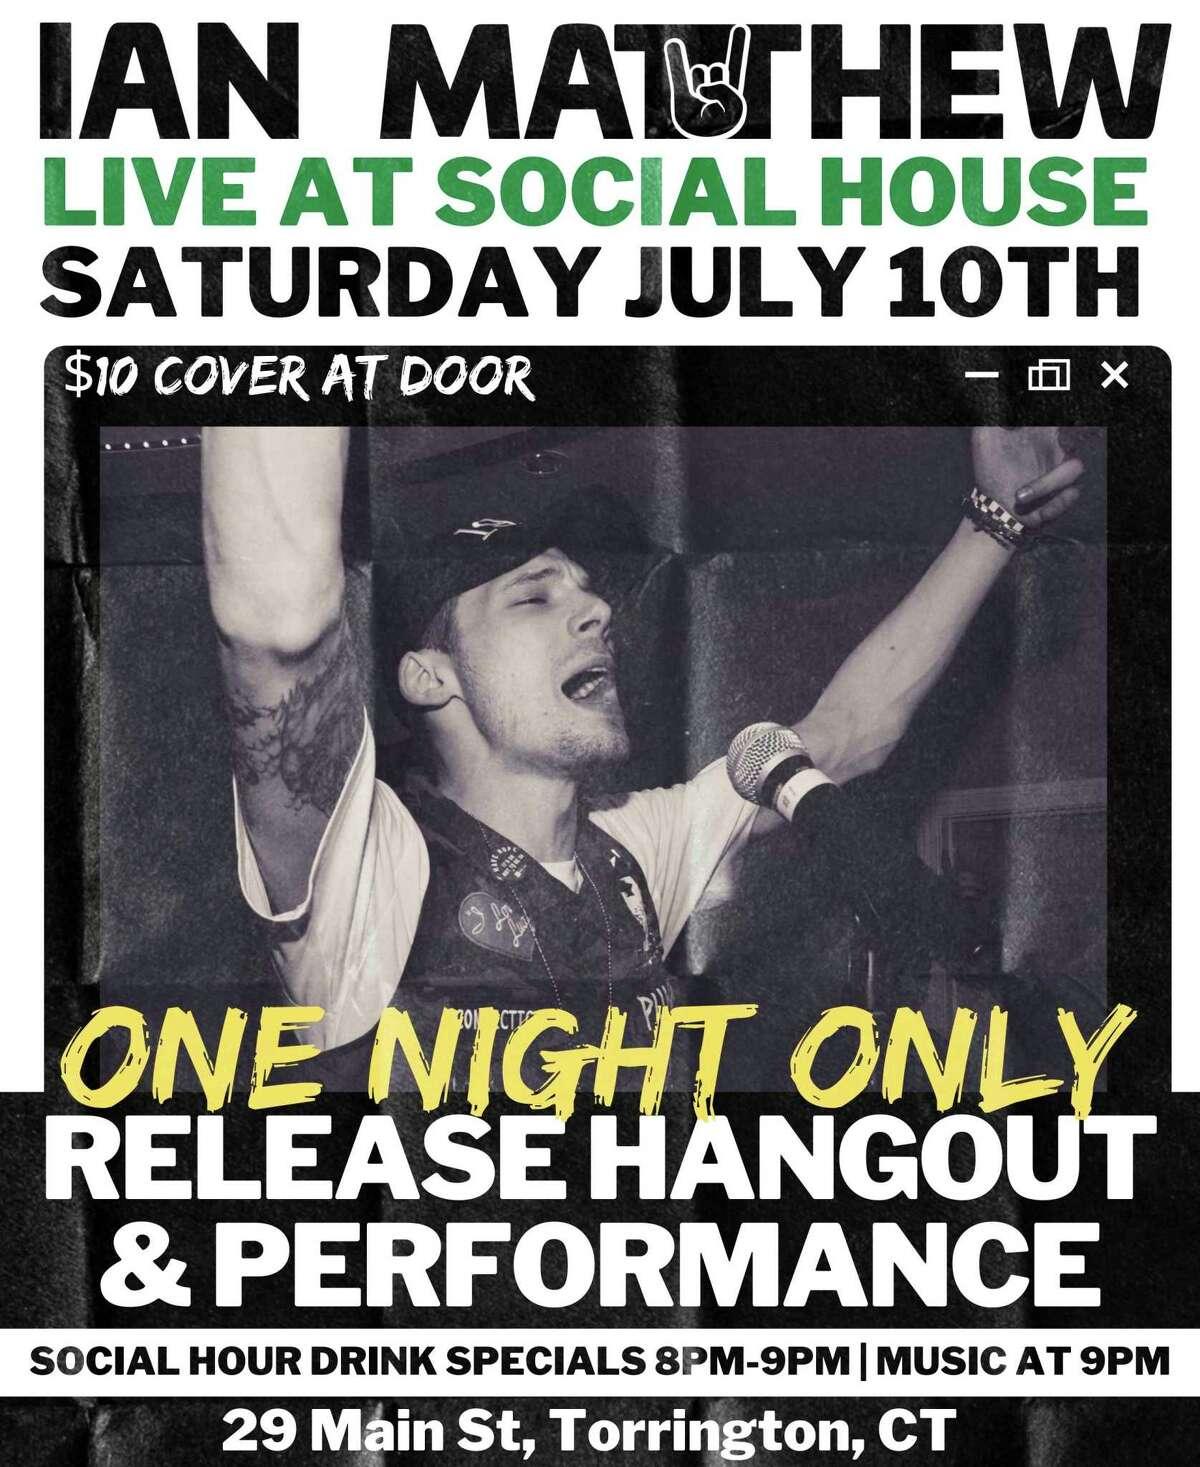 Singer Ian Matthew is performing Saturday at Social House in Torrington.